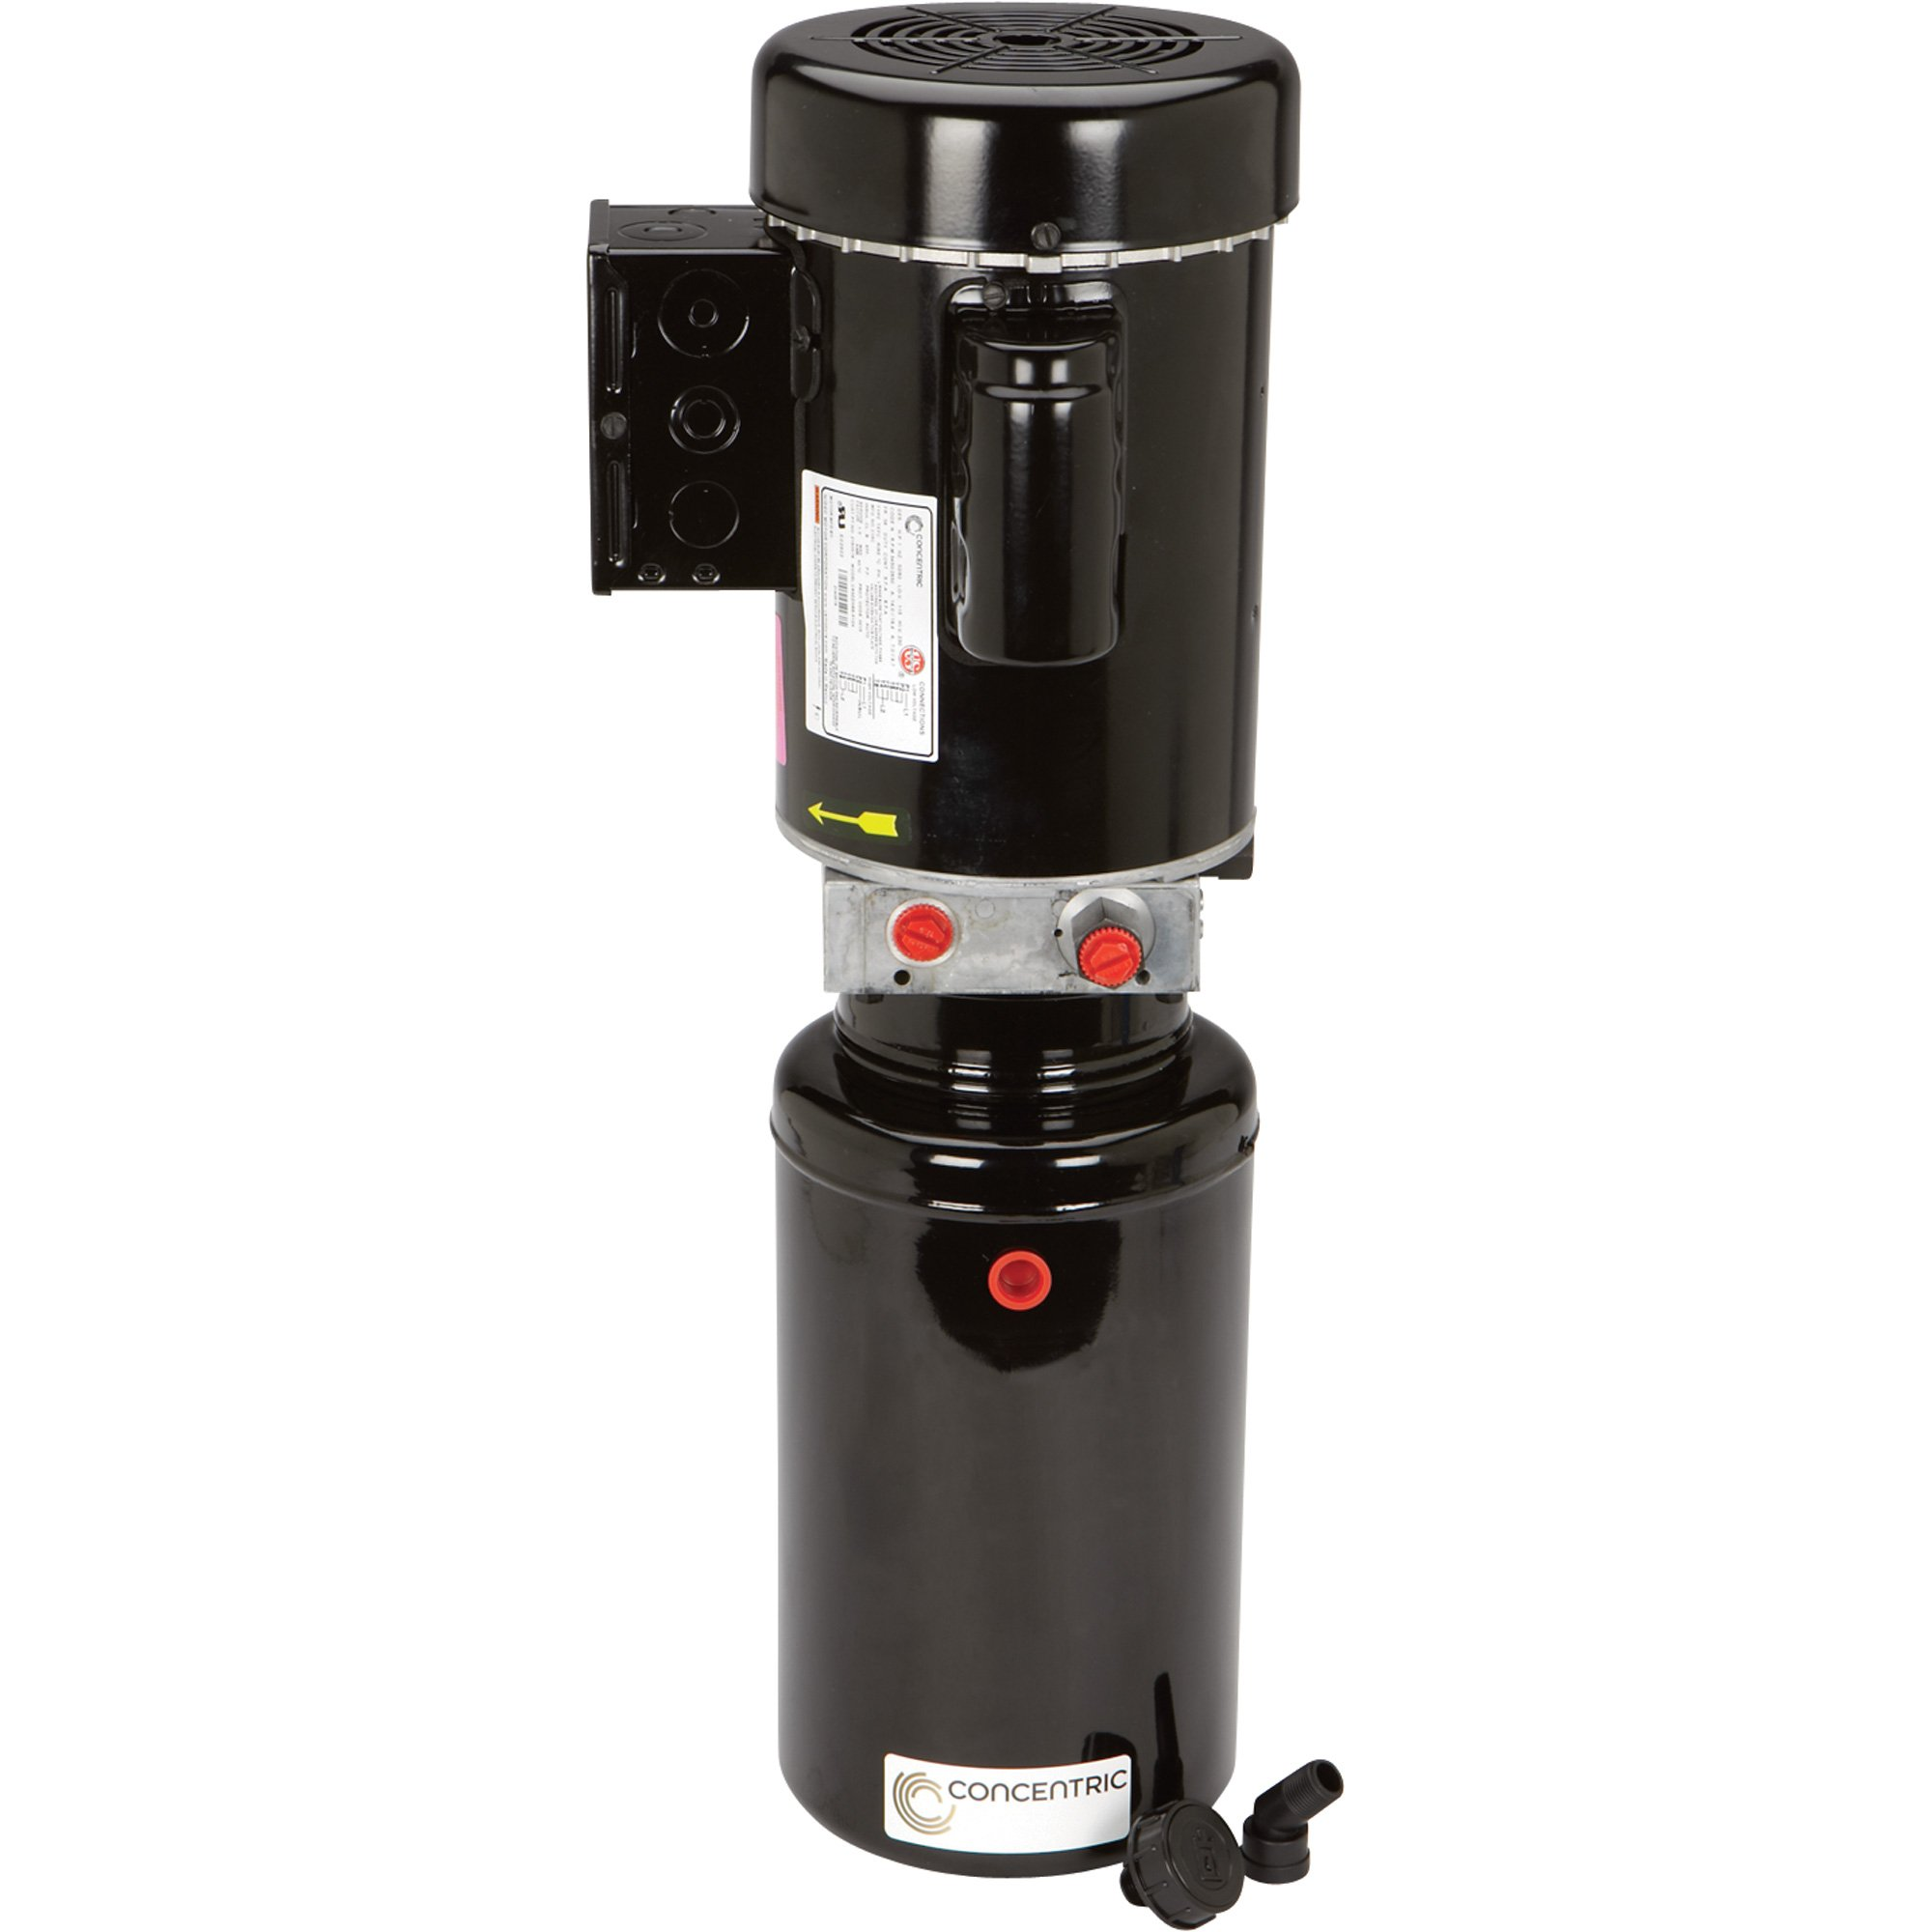 Concentric 1 HP 115/208-230 Volt AC Hydraulic Power Unit, Basic, Model# 1530036